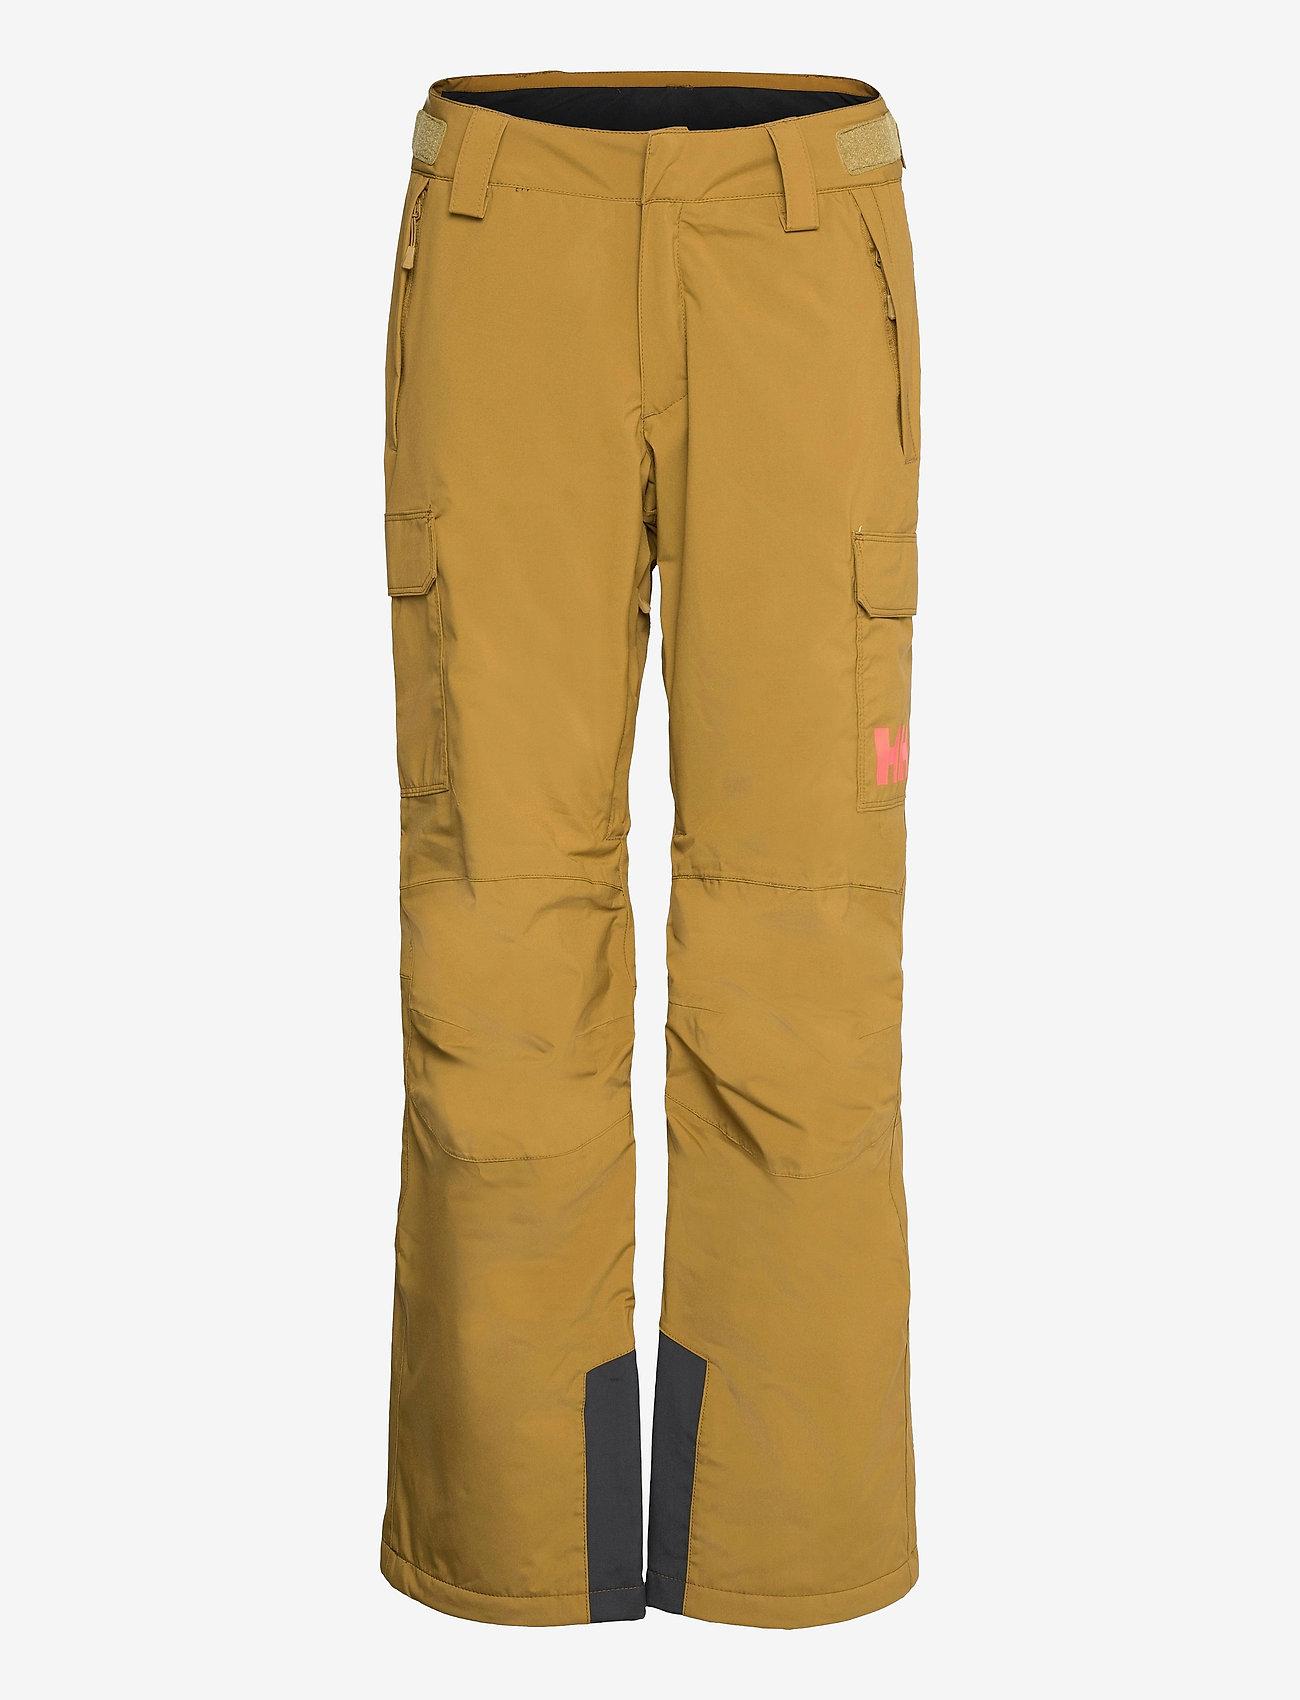 Helly Hansen - W SWITCH CARGO INSULATED PANT - skibroeken - uniform green - 0